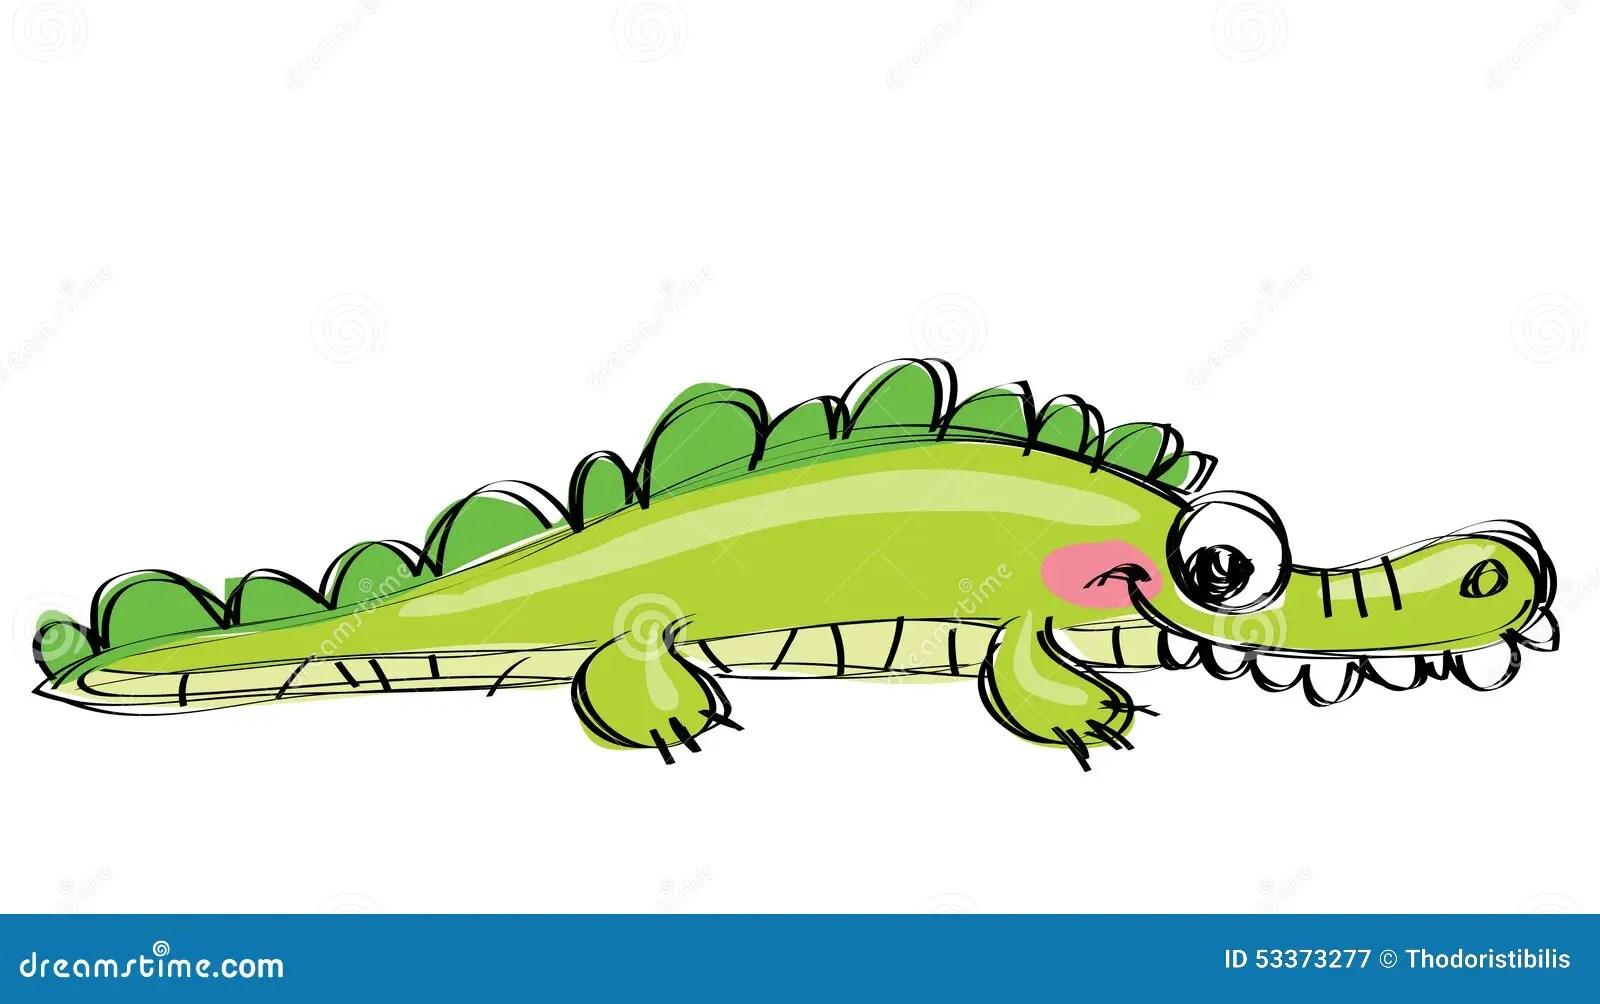 Cartoon Green Happy Crocodile With Funny Teeth As Children